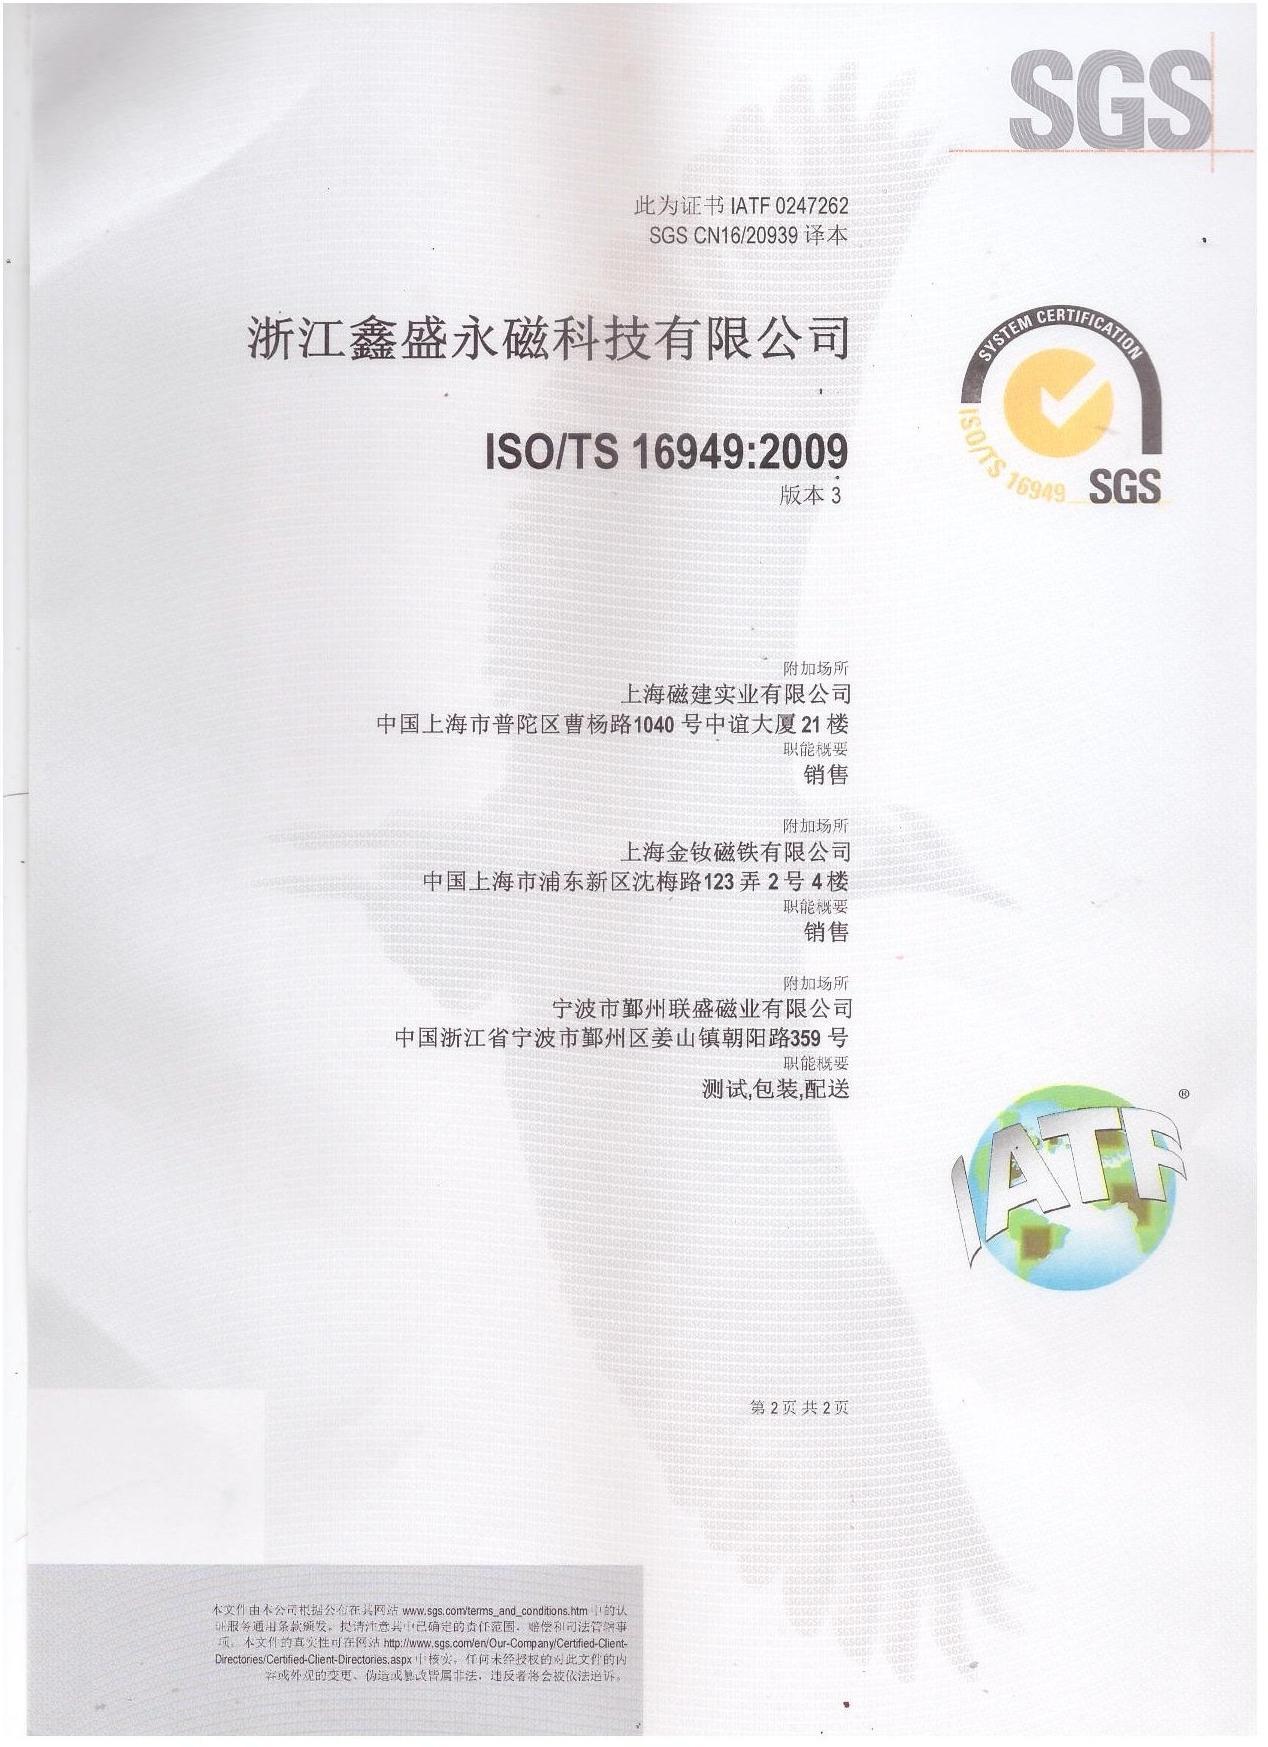 ISO-TS16949:2009 Chinese-2.JPG